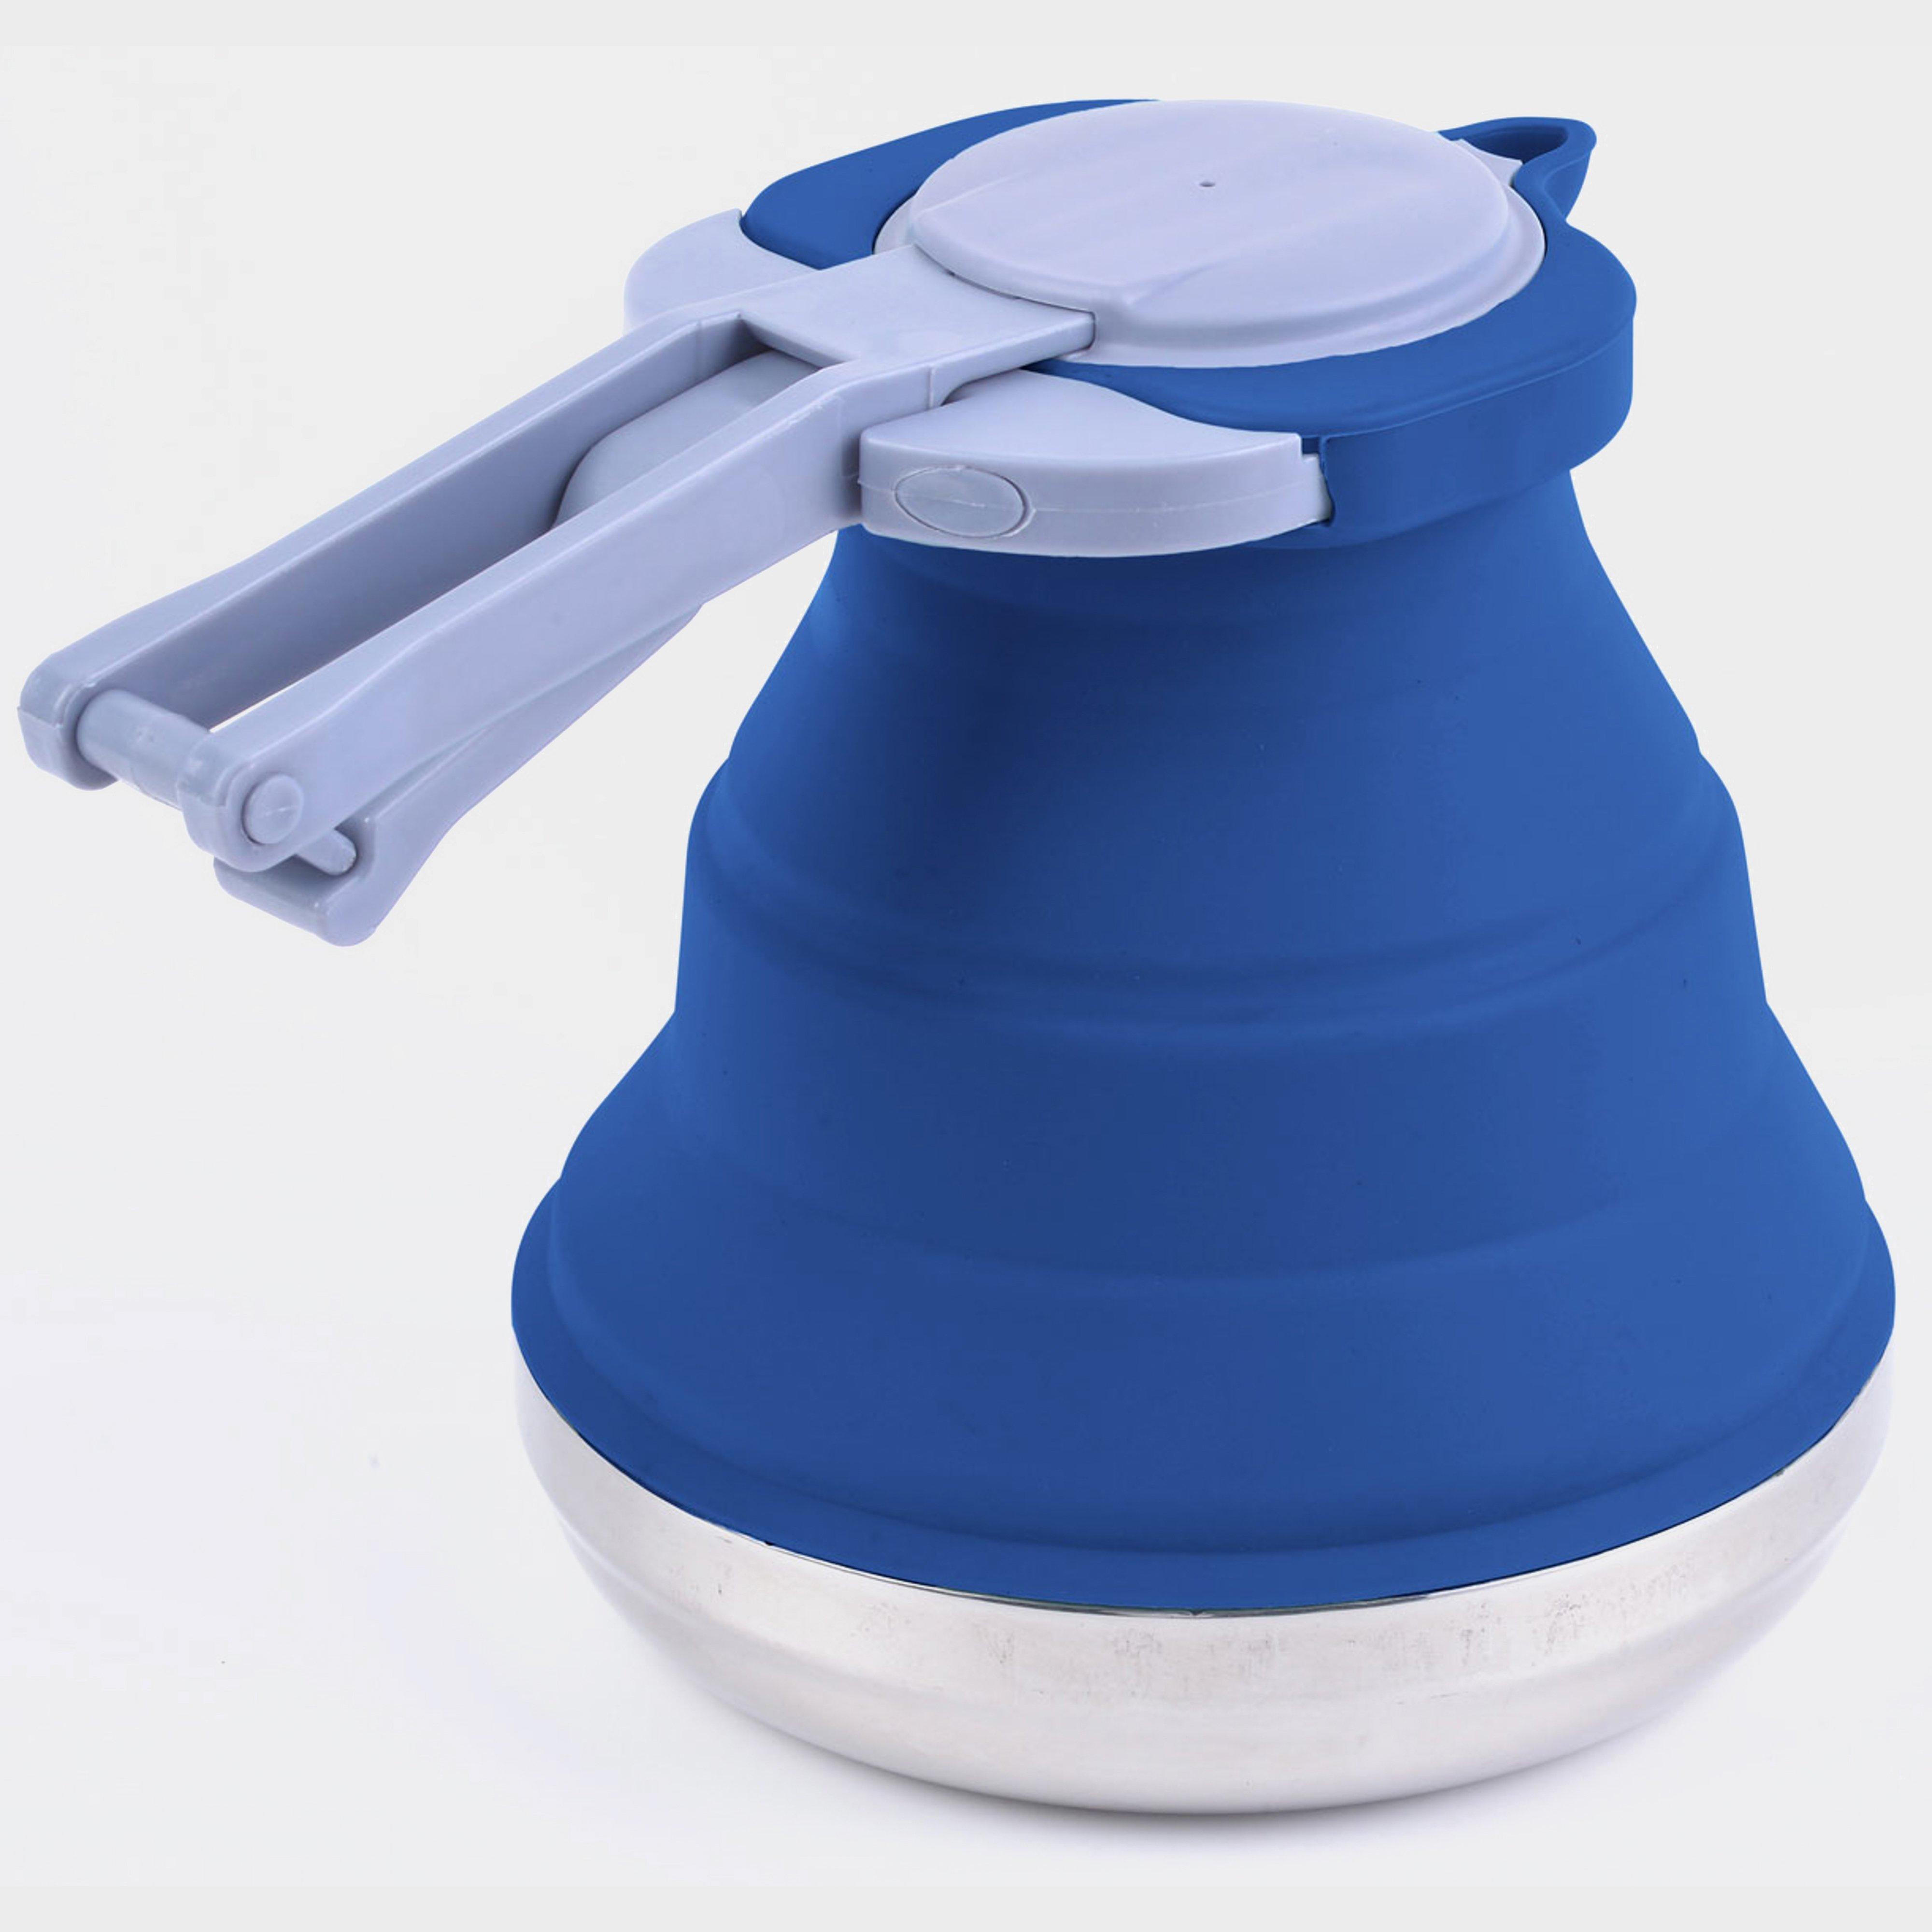 Hi-Gear Hi-Gear Collapsible Kettle 1.5L